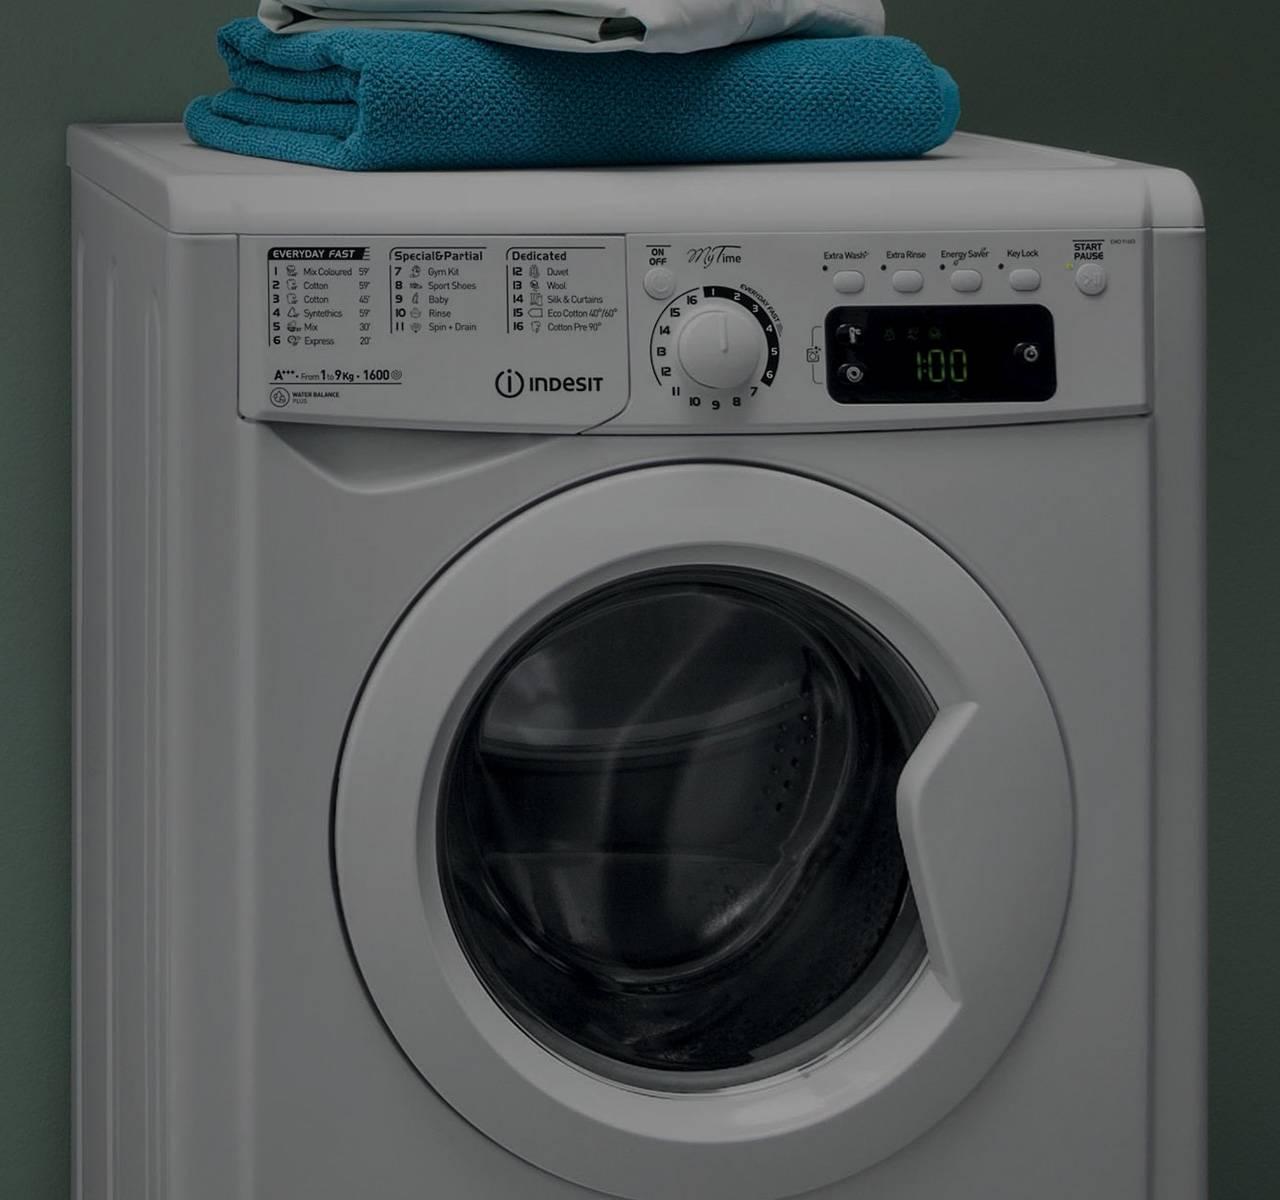 how to fix my washing machine timer